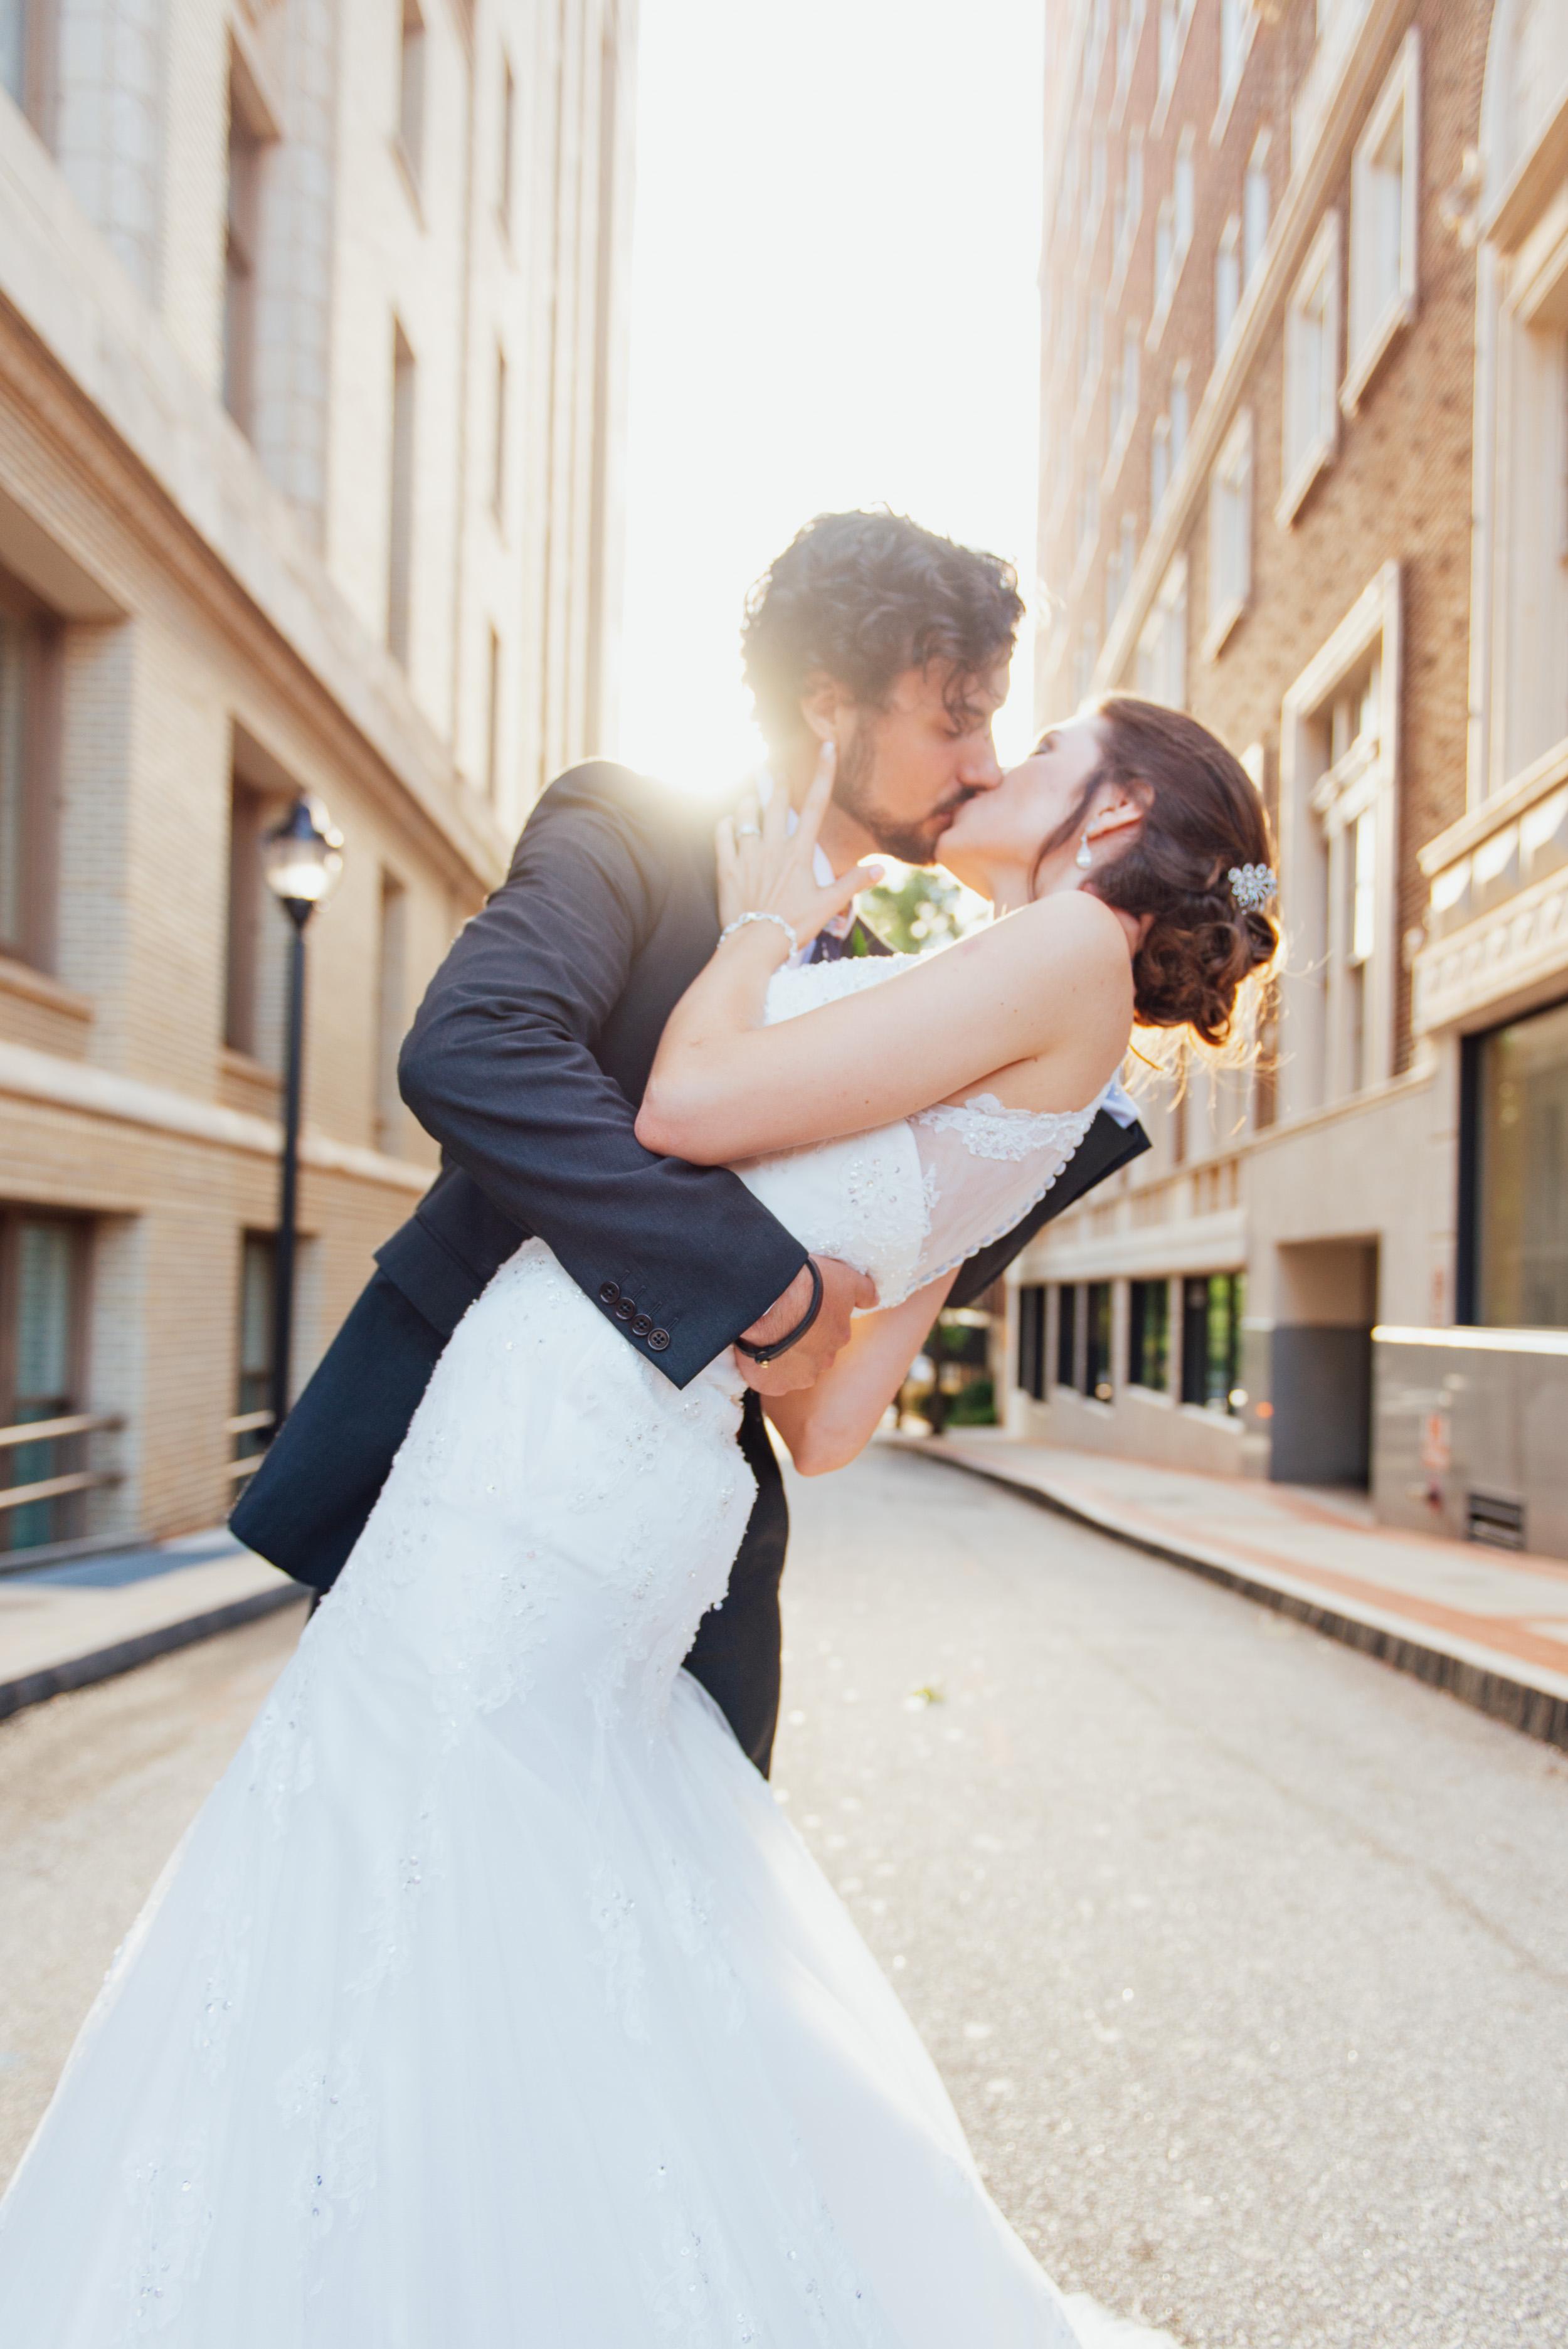 cleland-studios-wedding-photography-57.jpg